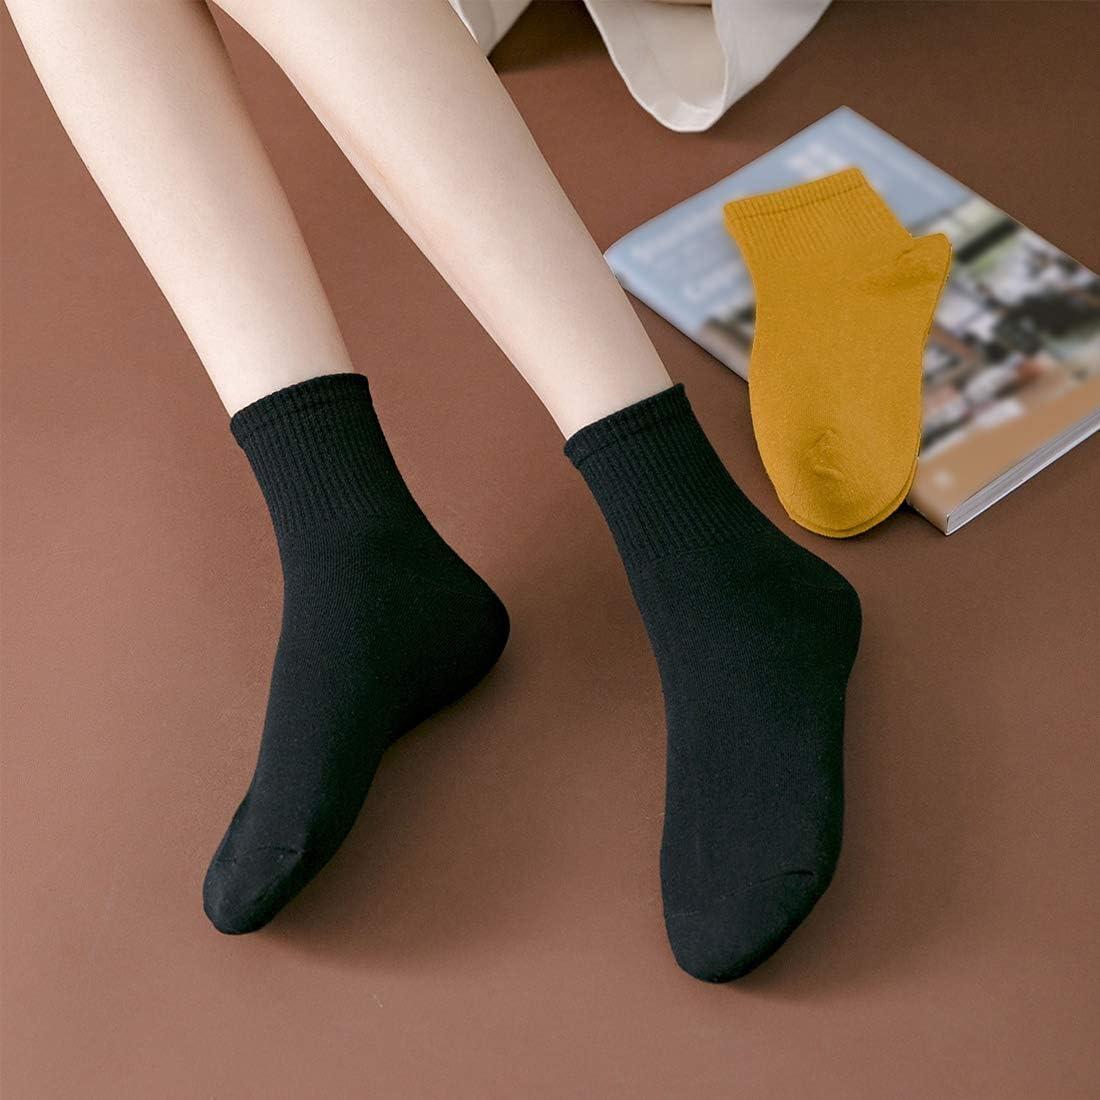 Hamjax 3 Pairs Womens Casual Socks Cotton Sneaker Socks Ankle Socks